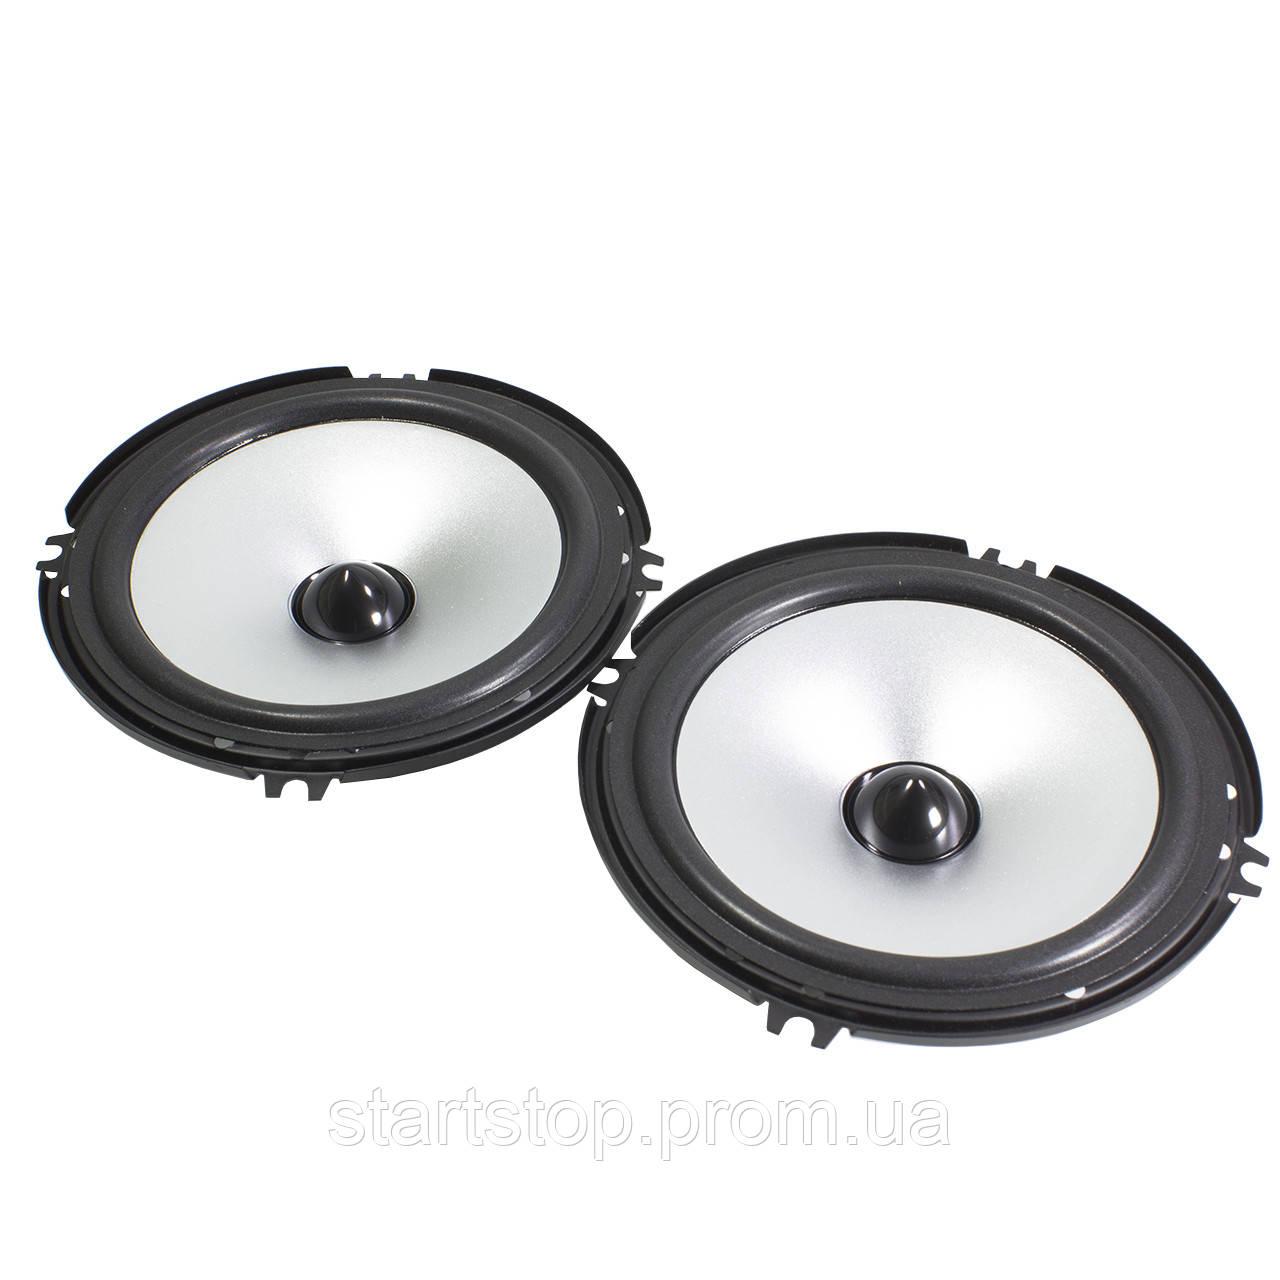 Купить Автоакустика Labo LB-PS1651D 60 Вт (2399-7396)